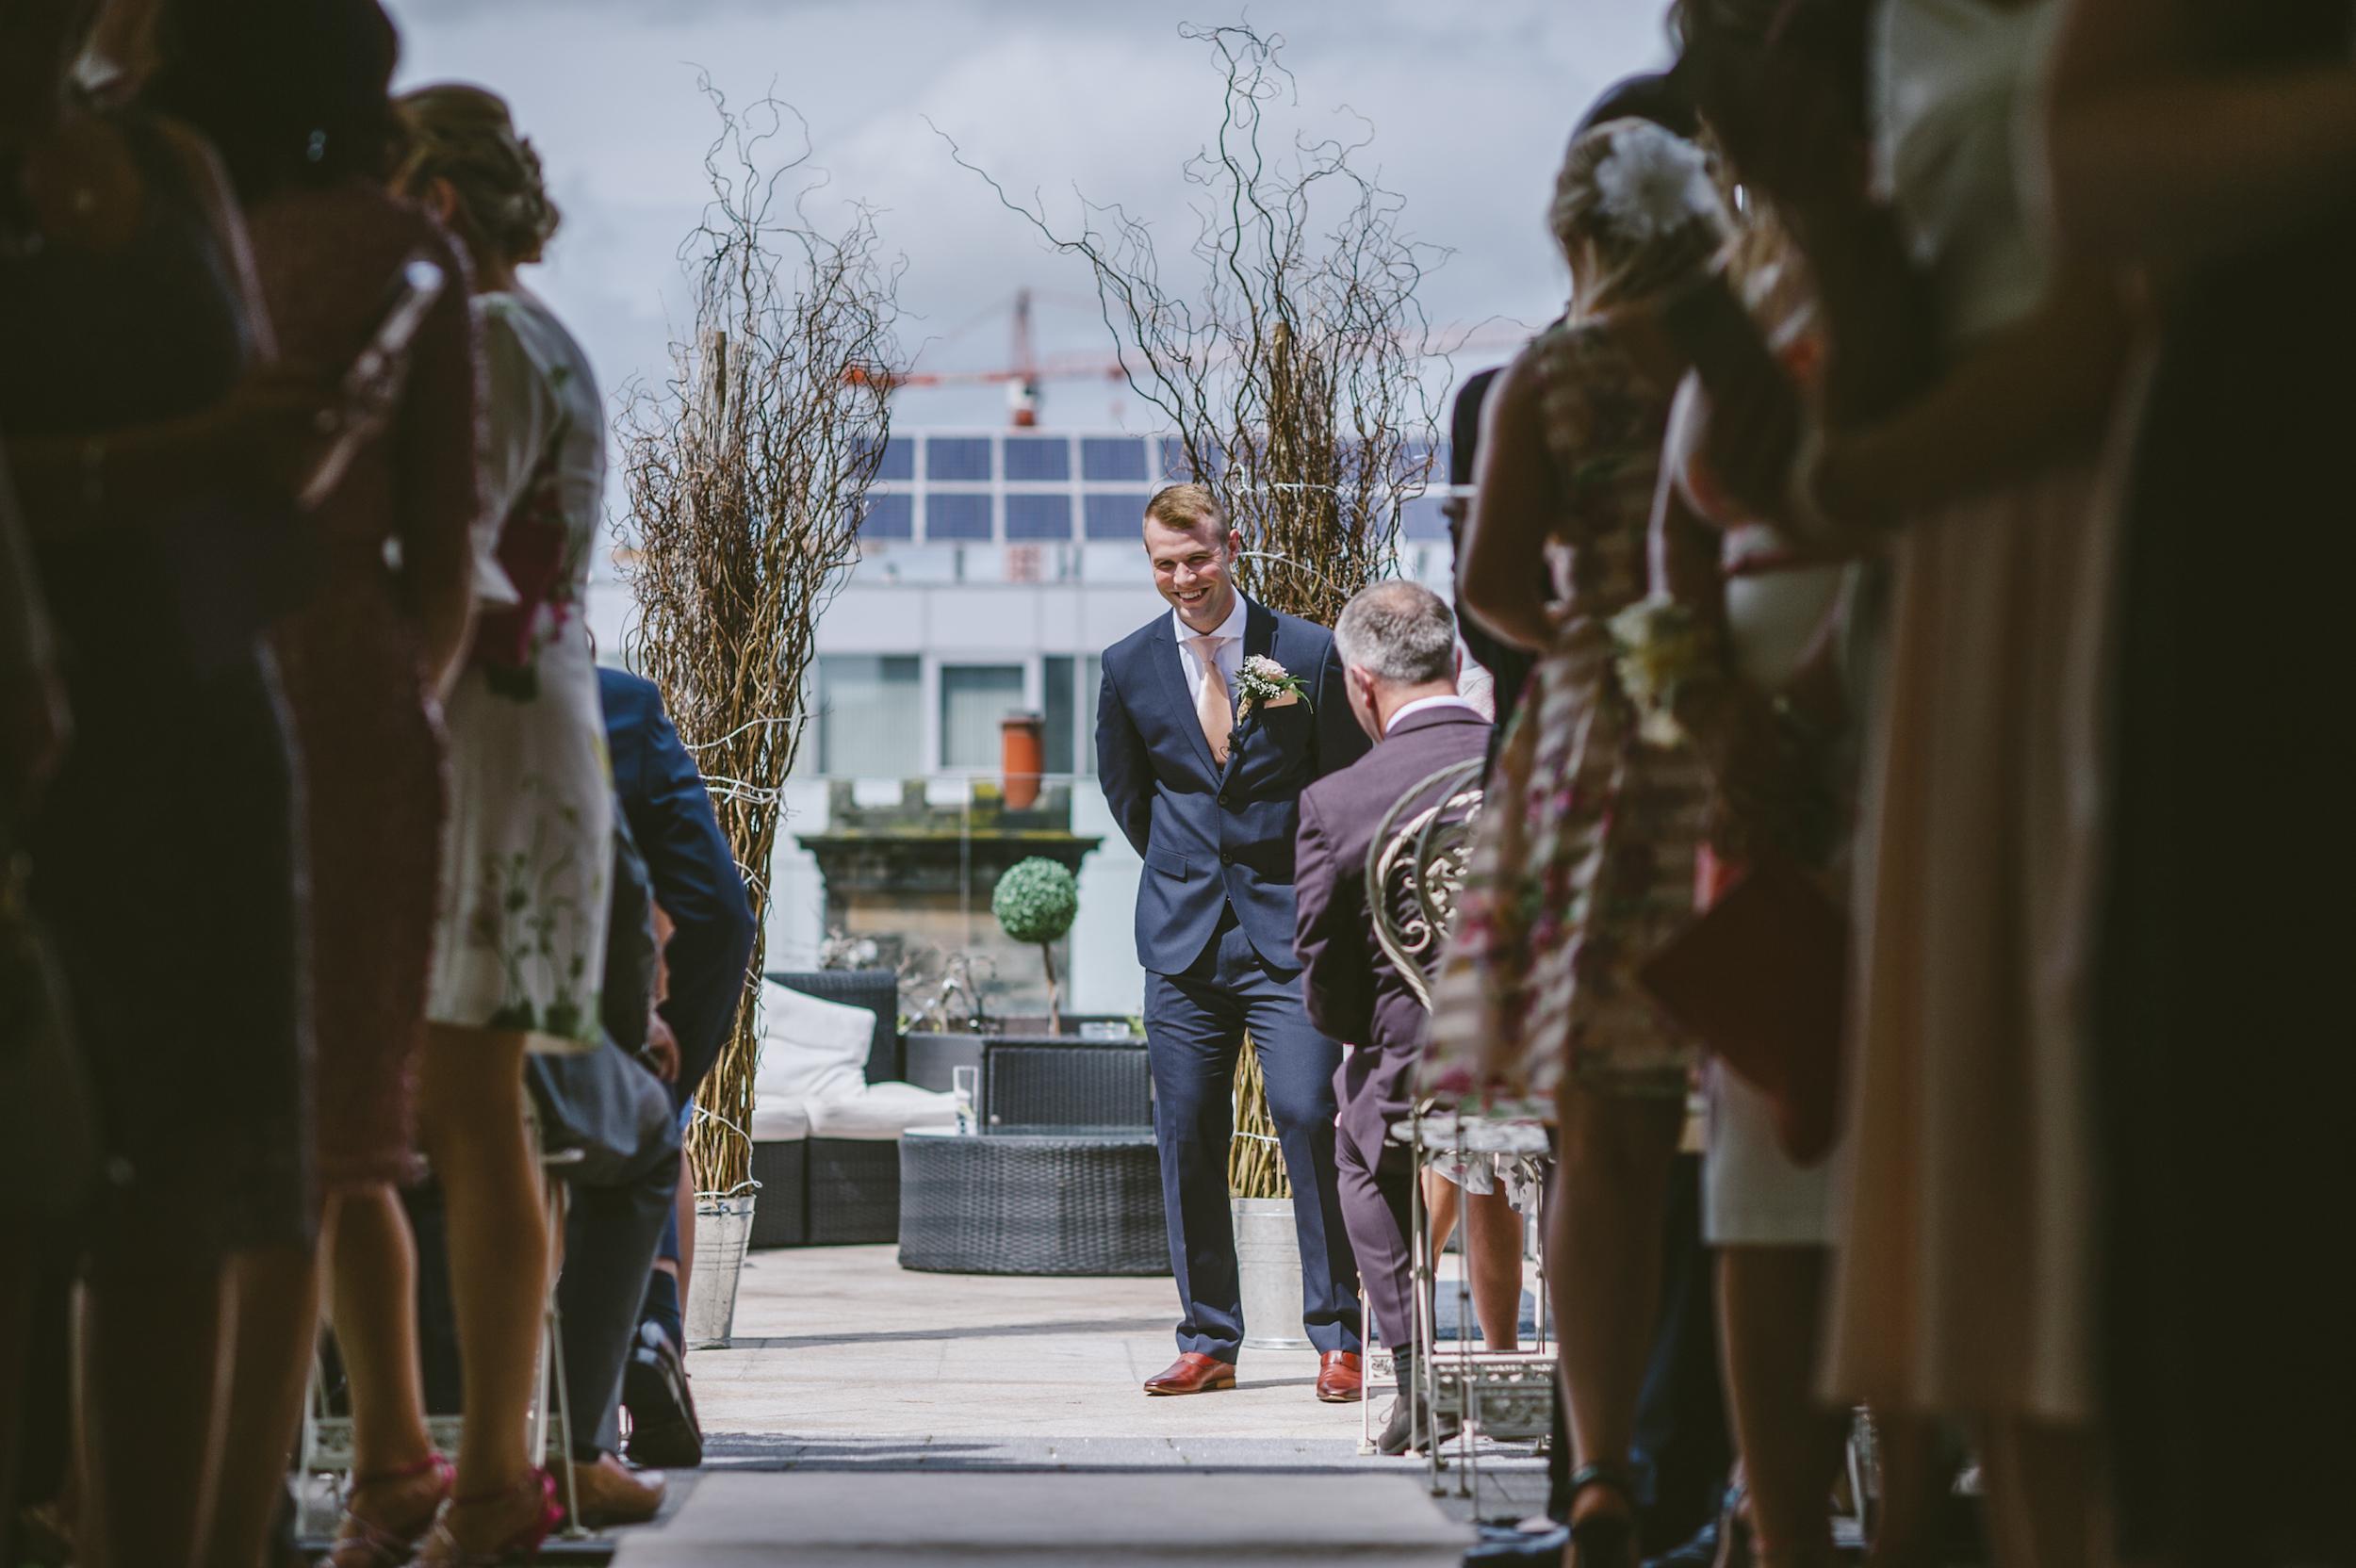 Francis_meaney_photography_merchant_hotel_wedding_belfast_inspire_weddings_2.jpeg